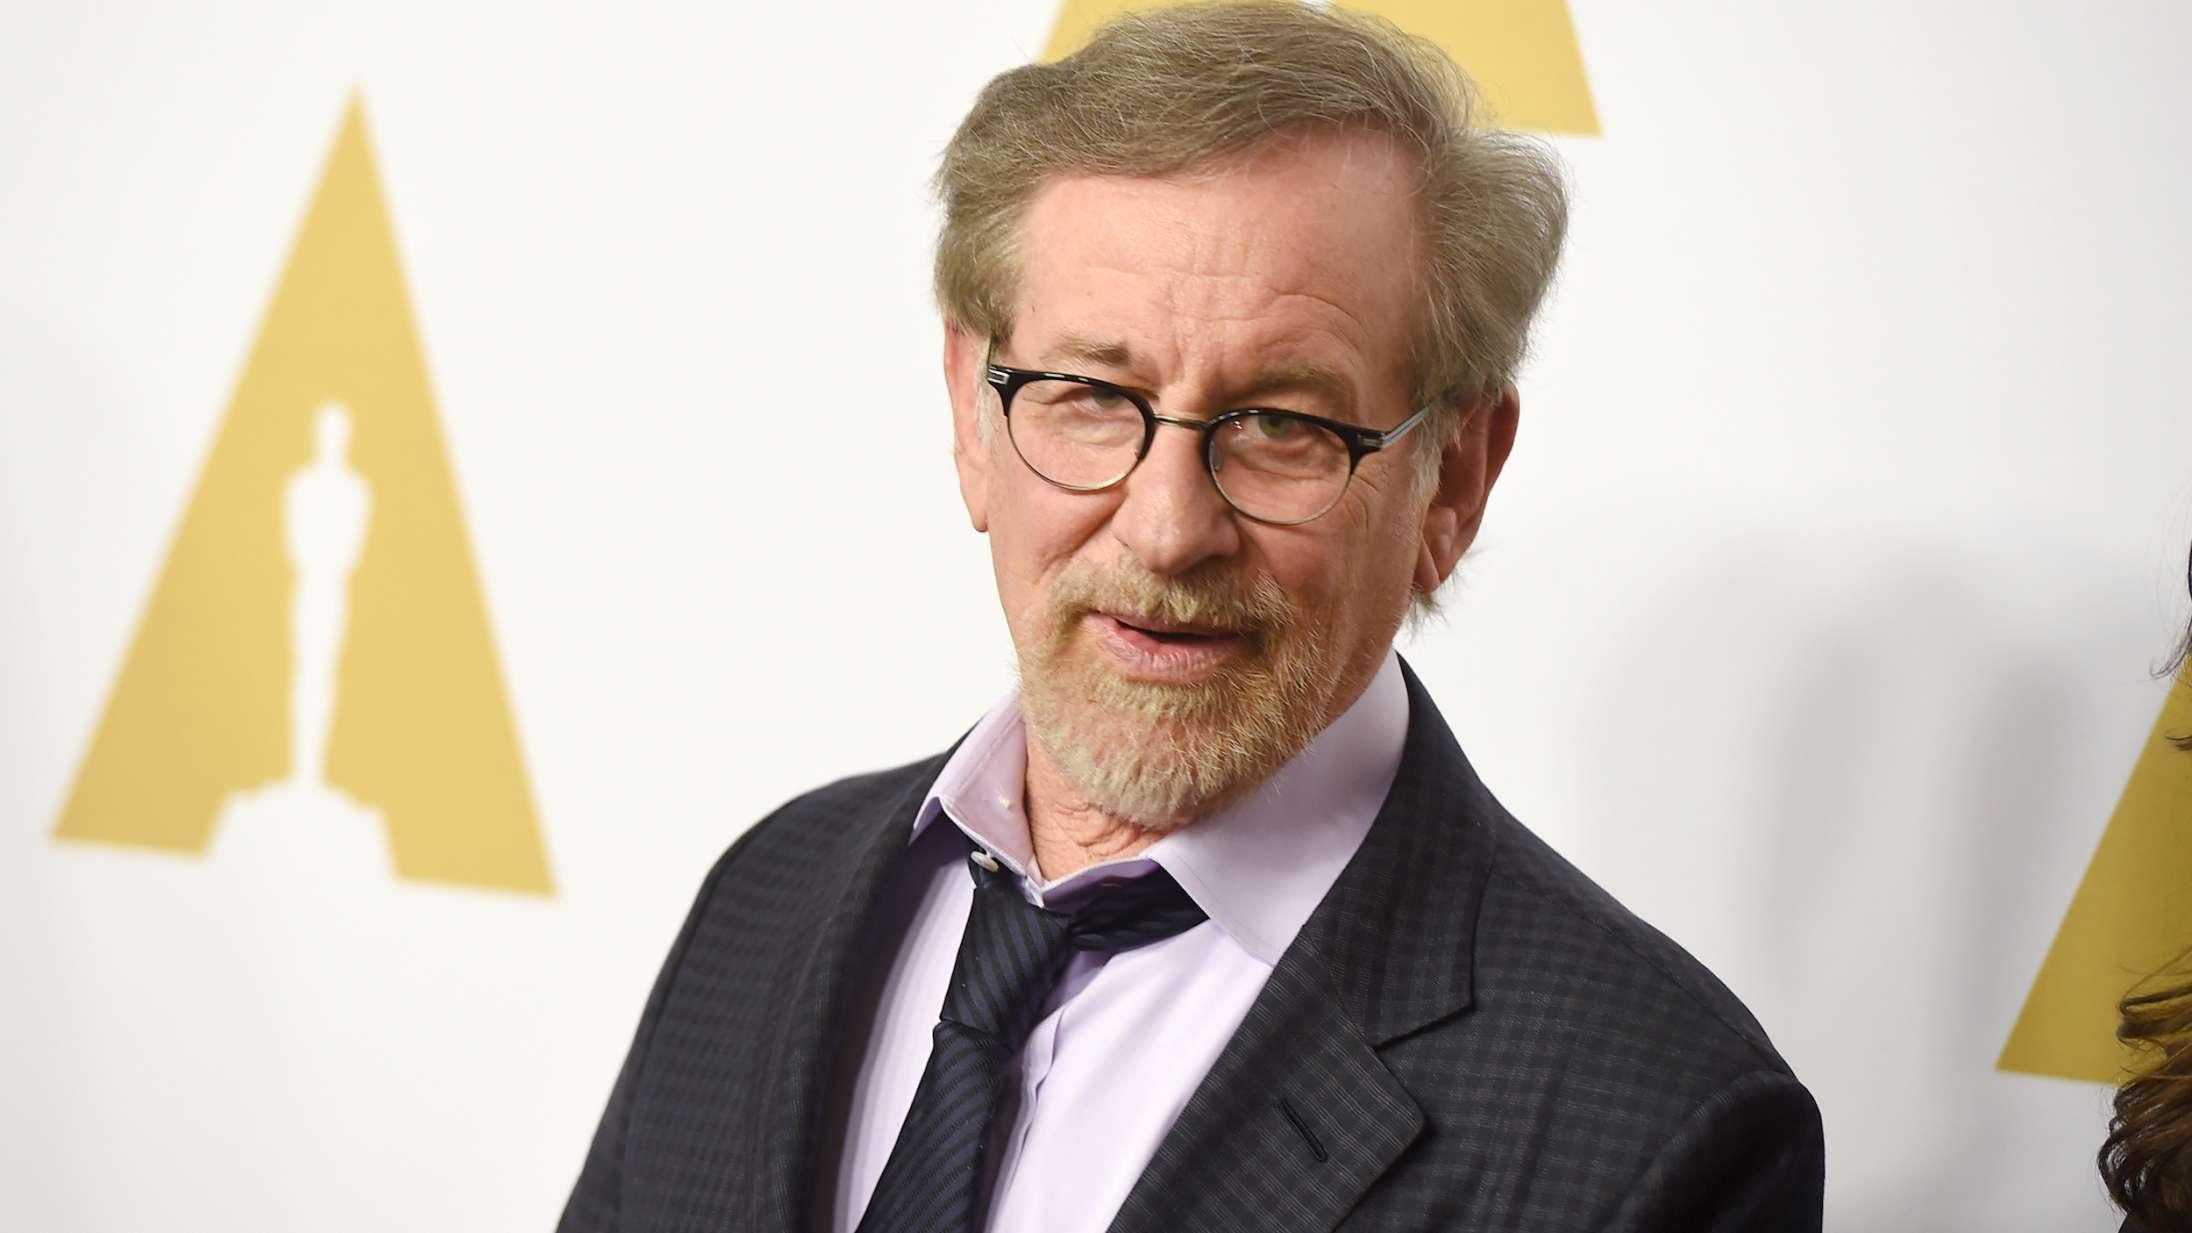 Steven Spielberg går sammen med 'Stranger Things'-skabere om passionsprojekt på Netflix